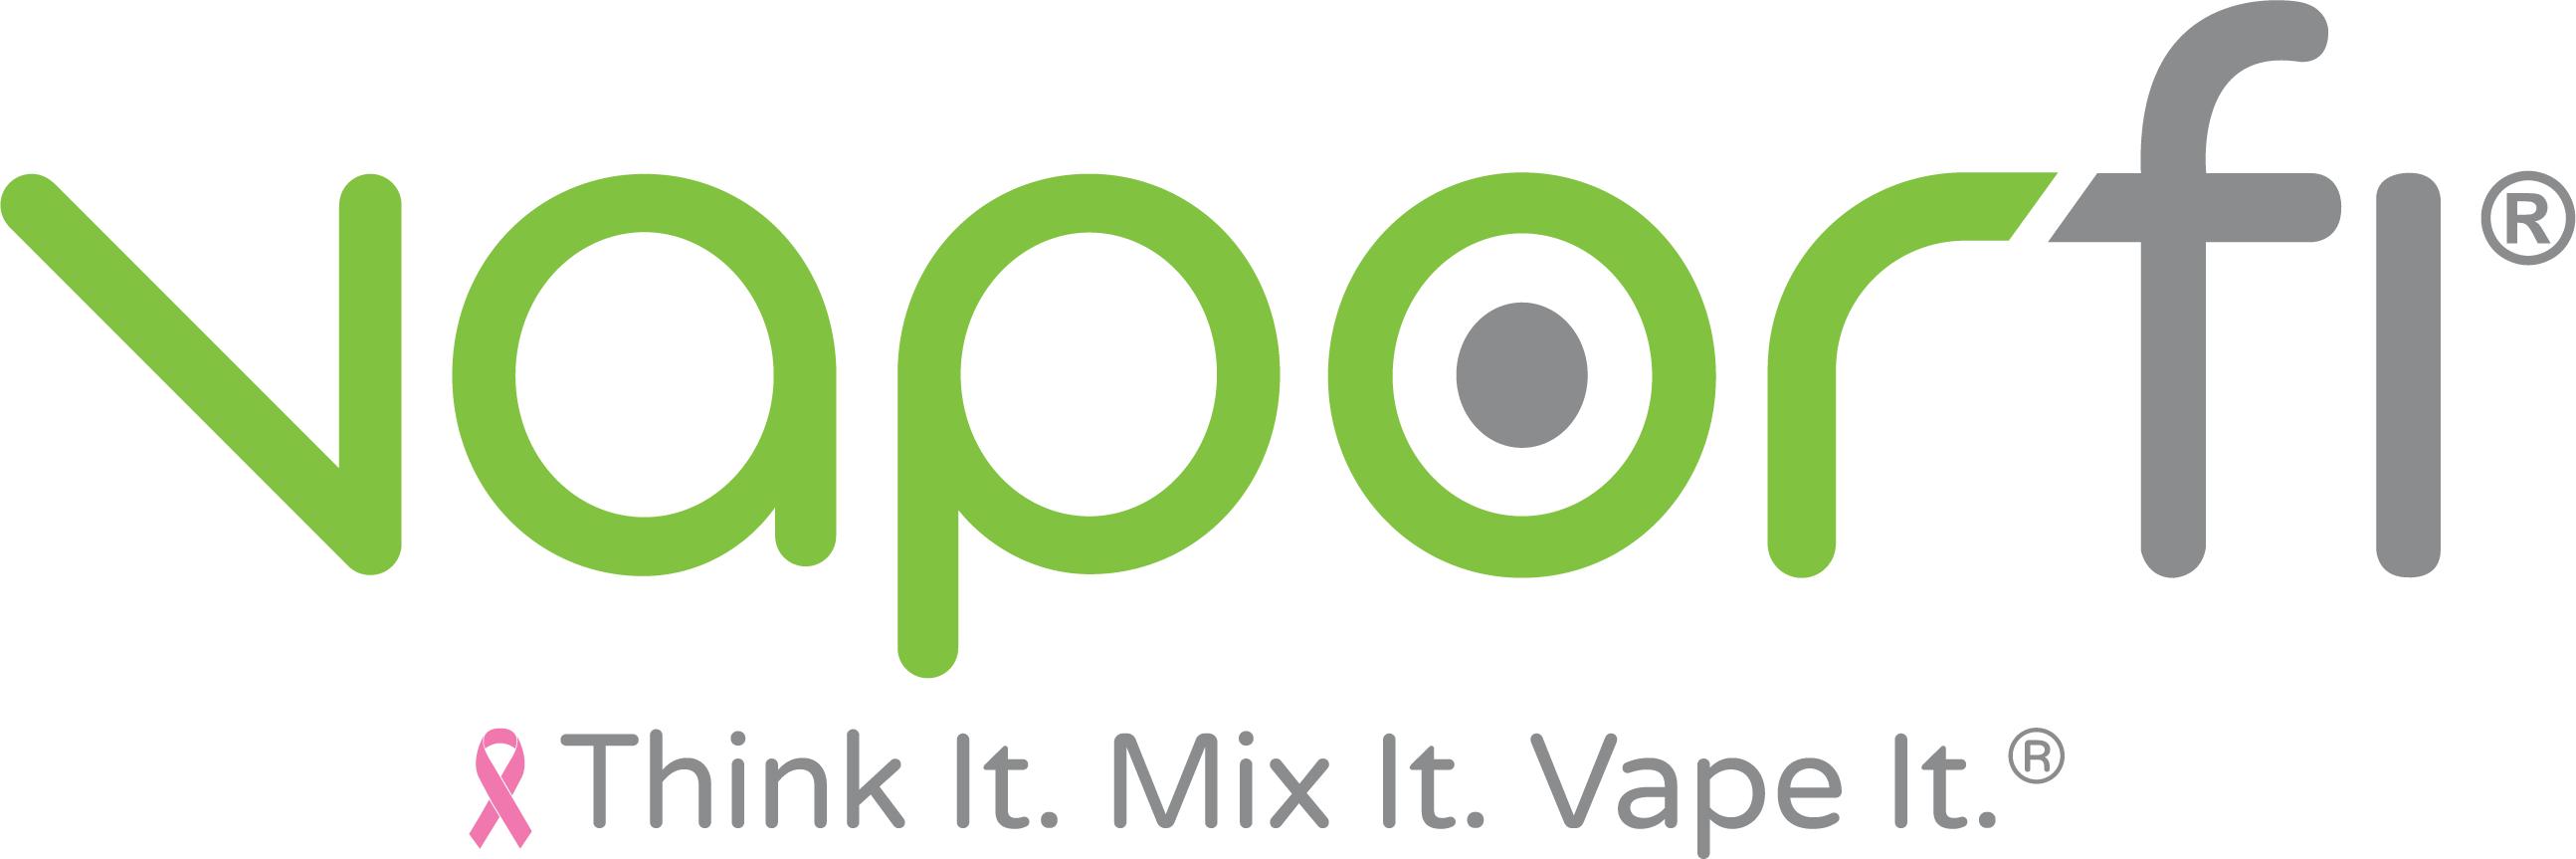 VaporFi Promo Codes